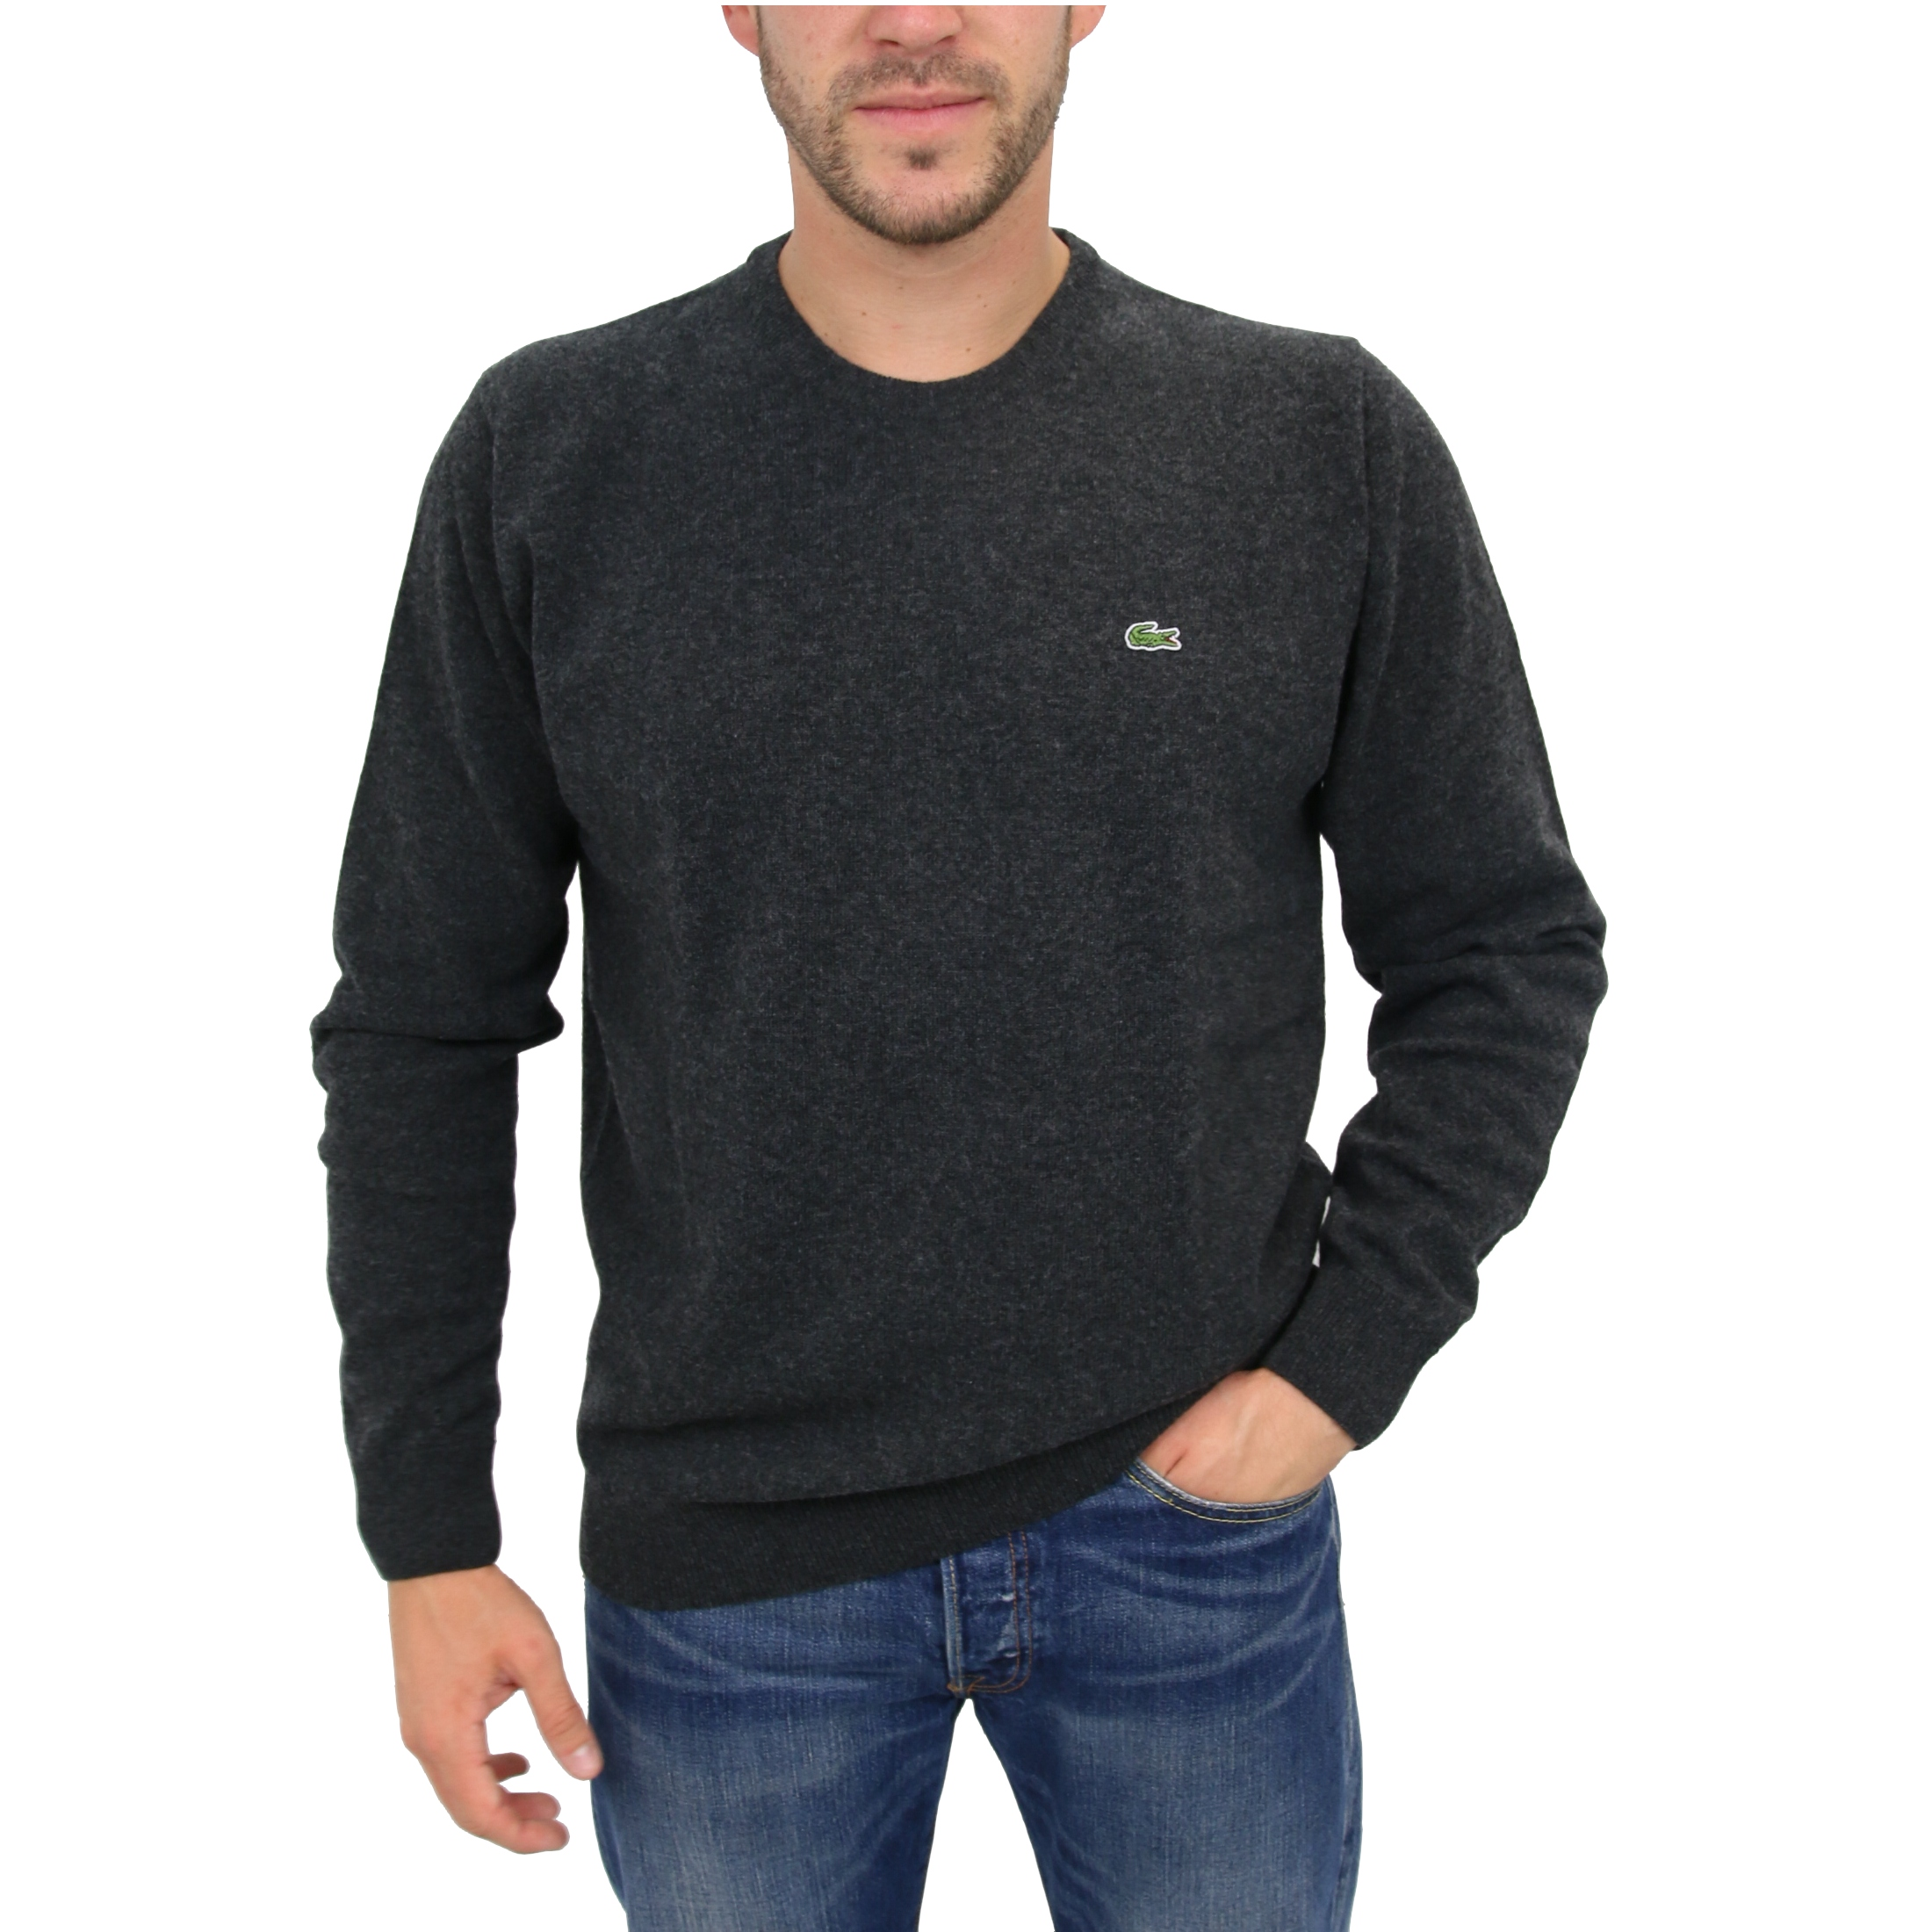 lacoste wollpullover pullover strickpullover rundhals. Black Bedroom Furniture Sets. Home Design Ideas